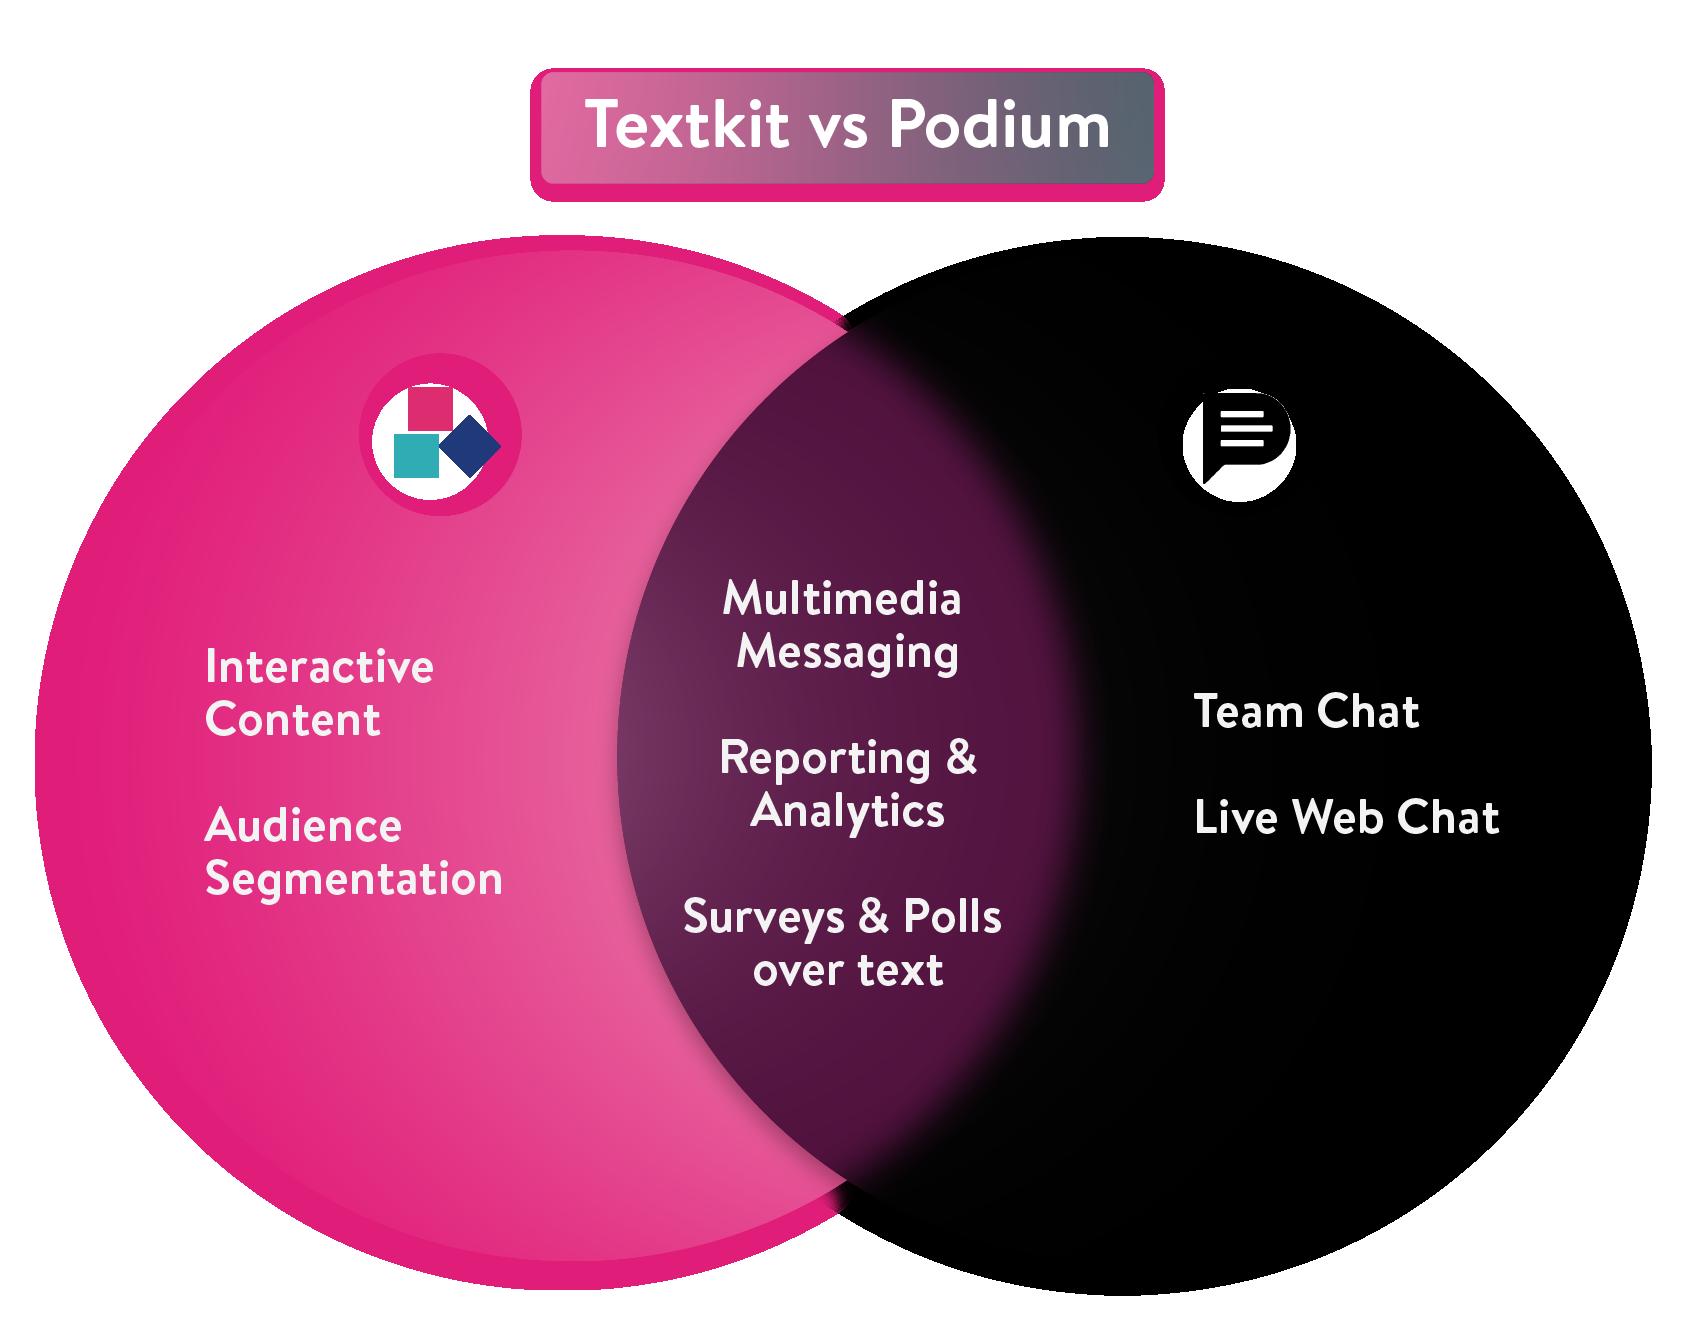 TextKit vs Podium